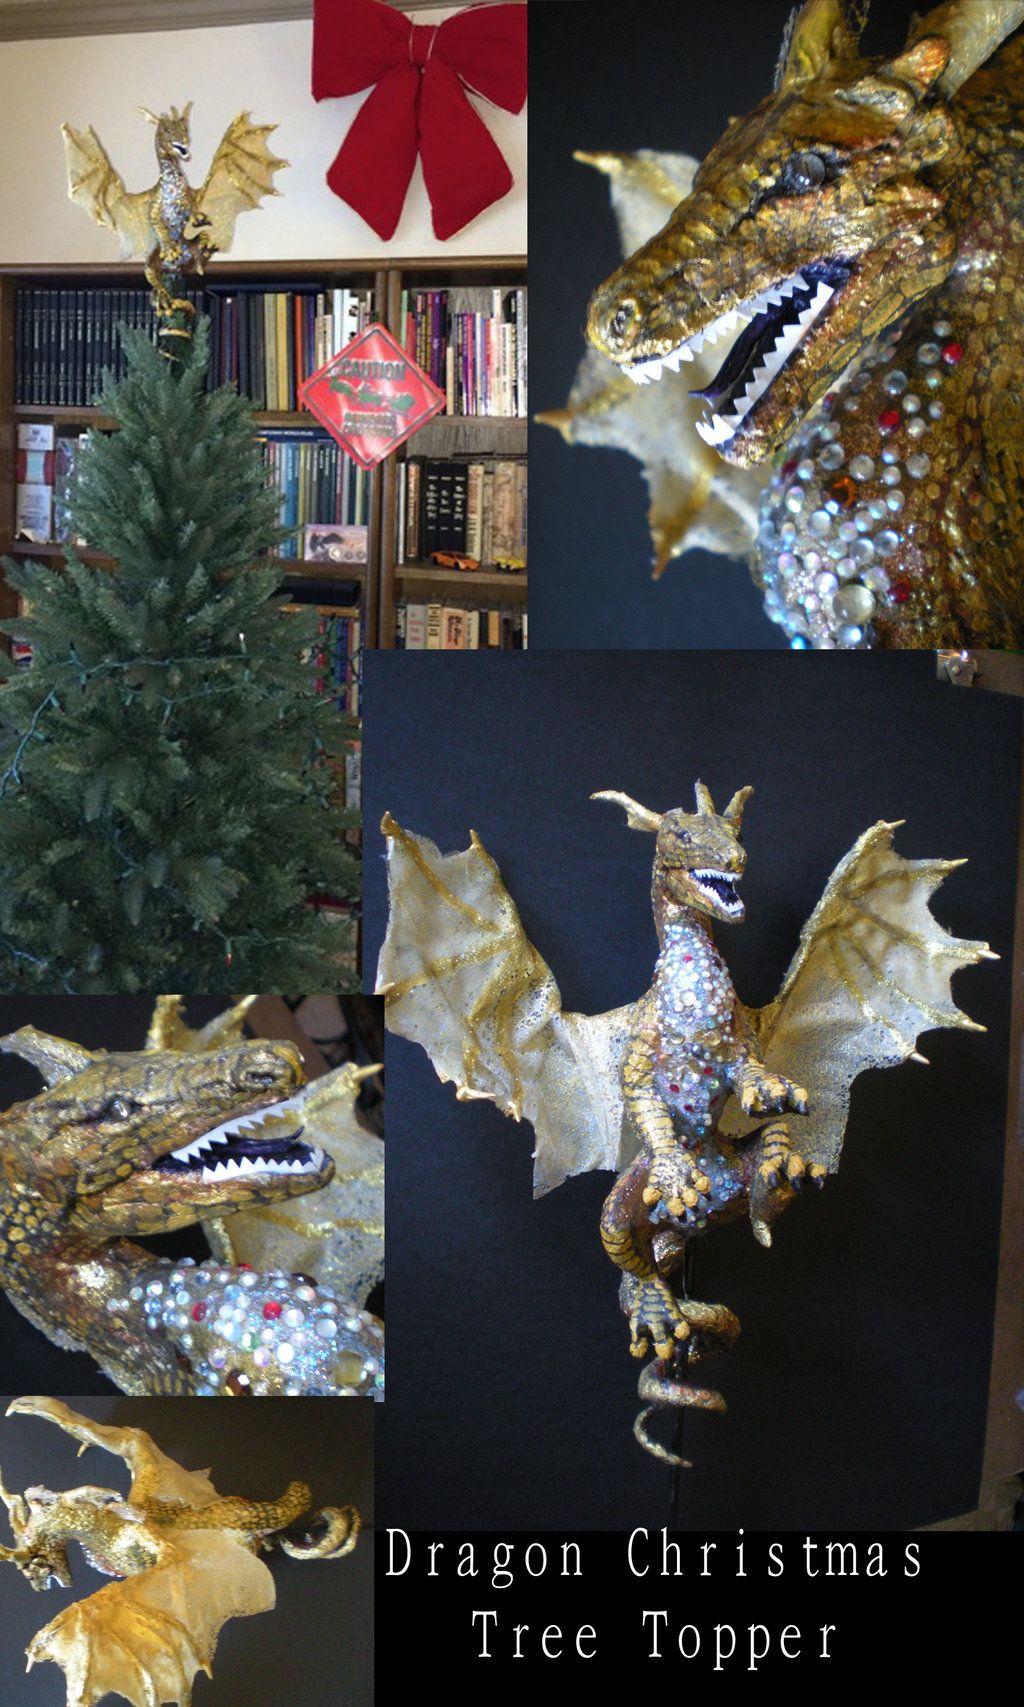 Dragon Christmas Tree Topper By Shadowind Deviantart Com On